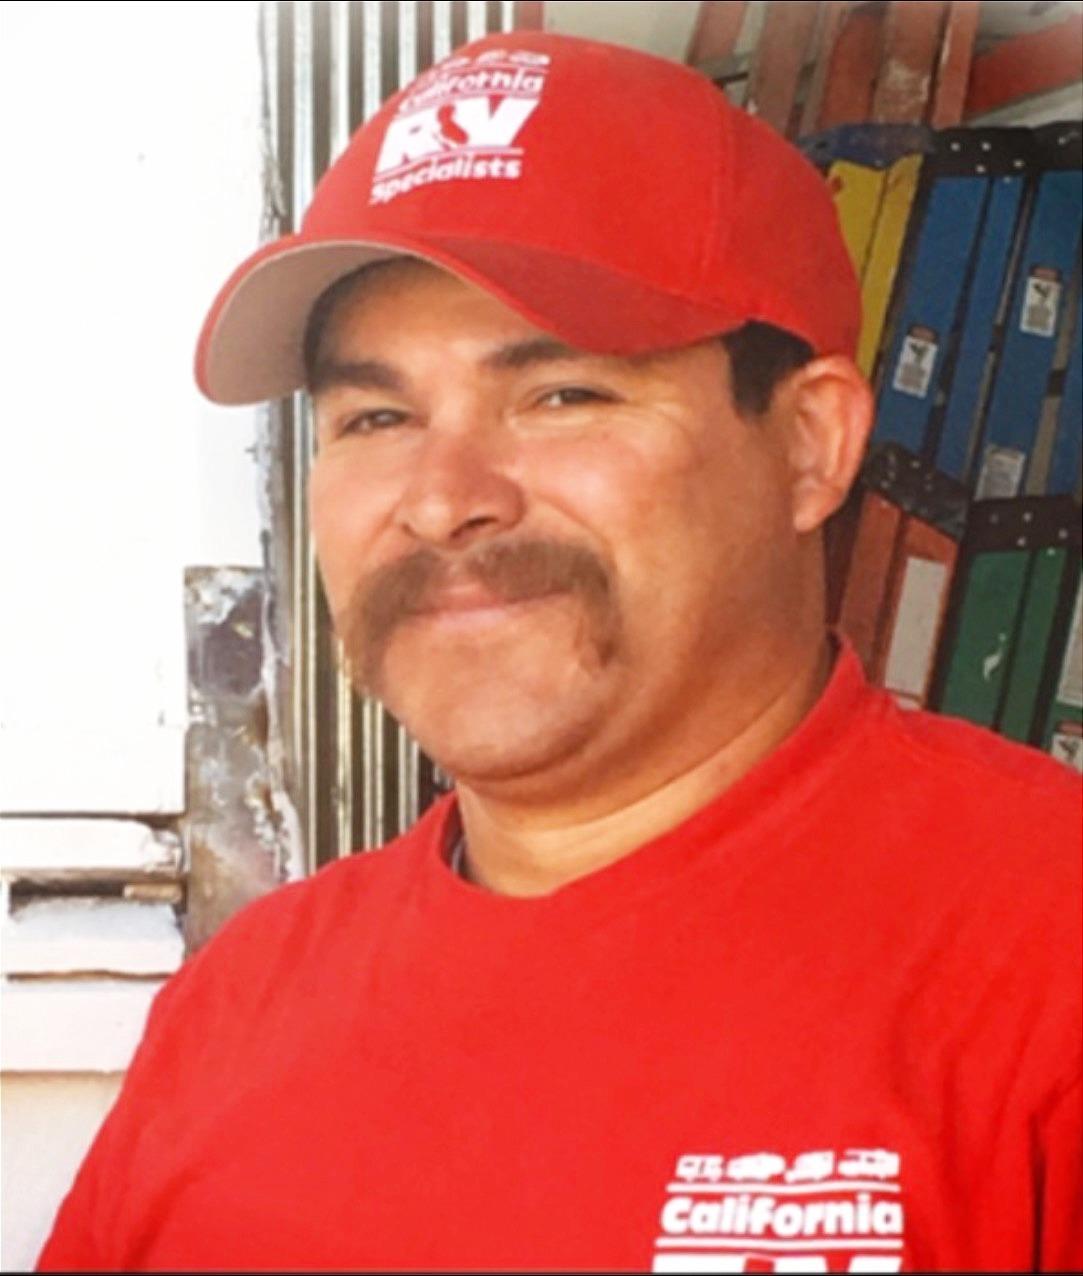 Fructuoso Contreras